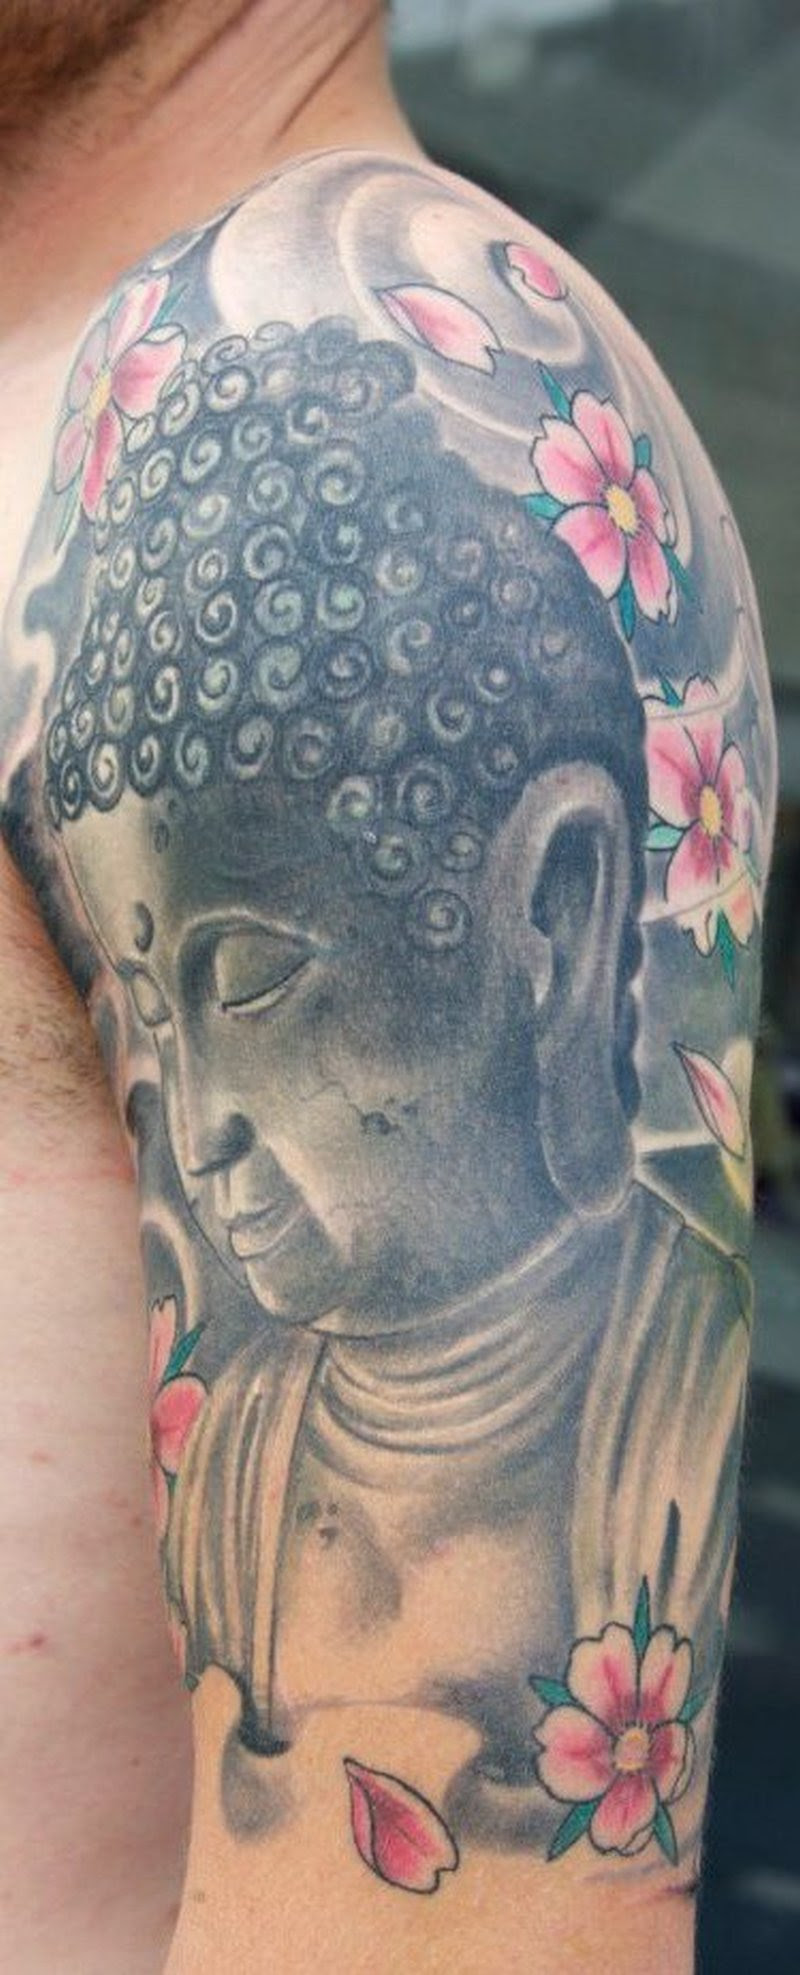 Half Sleeve Buddhist Tattoo Design Tattoos Book 65000 Tattoos